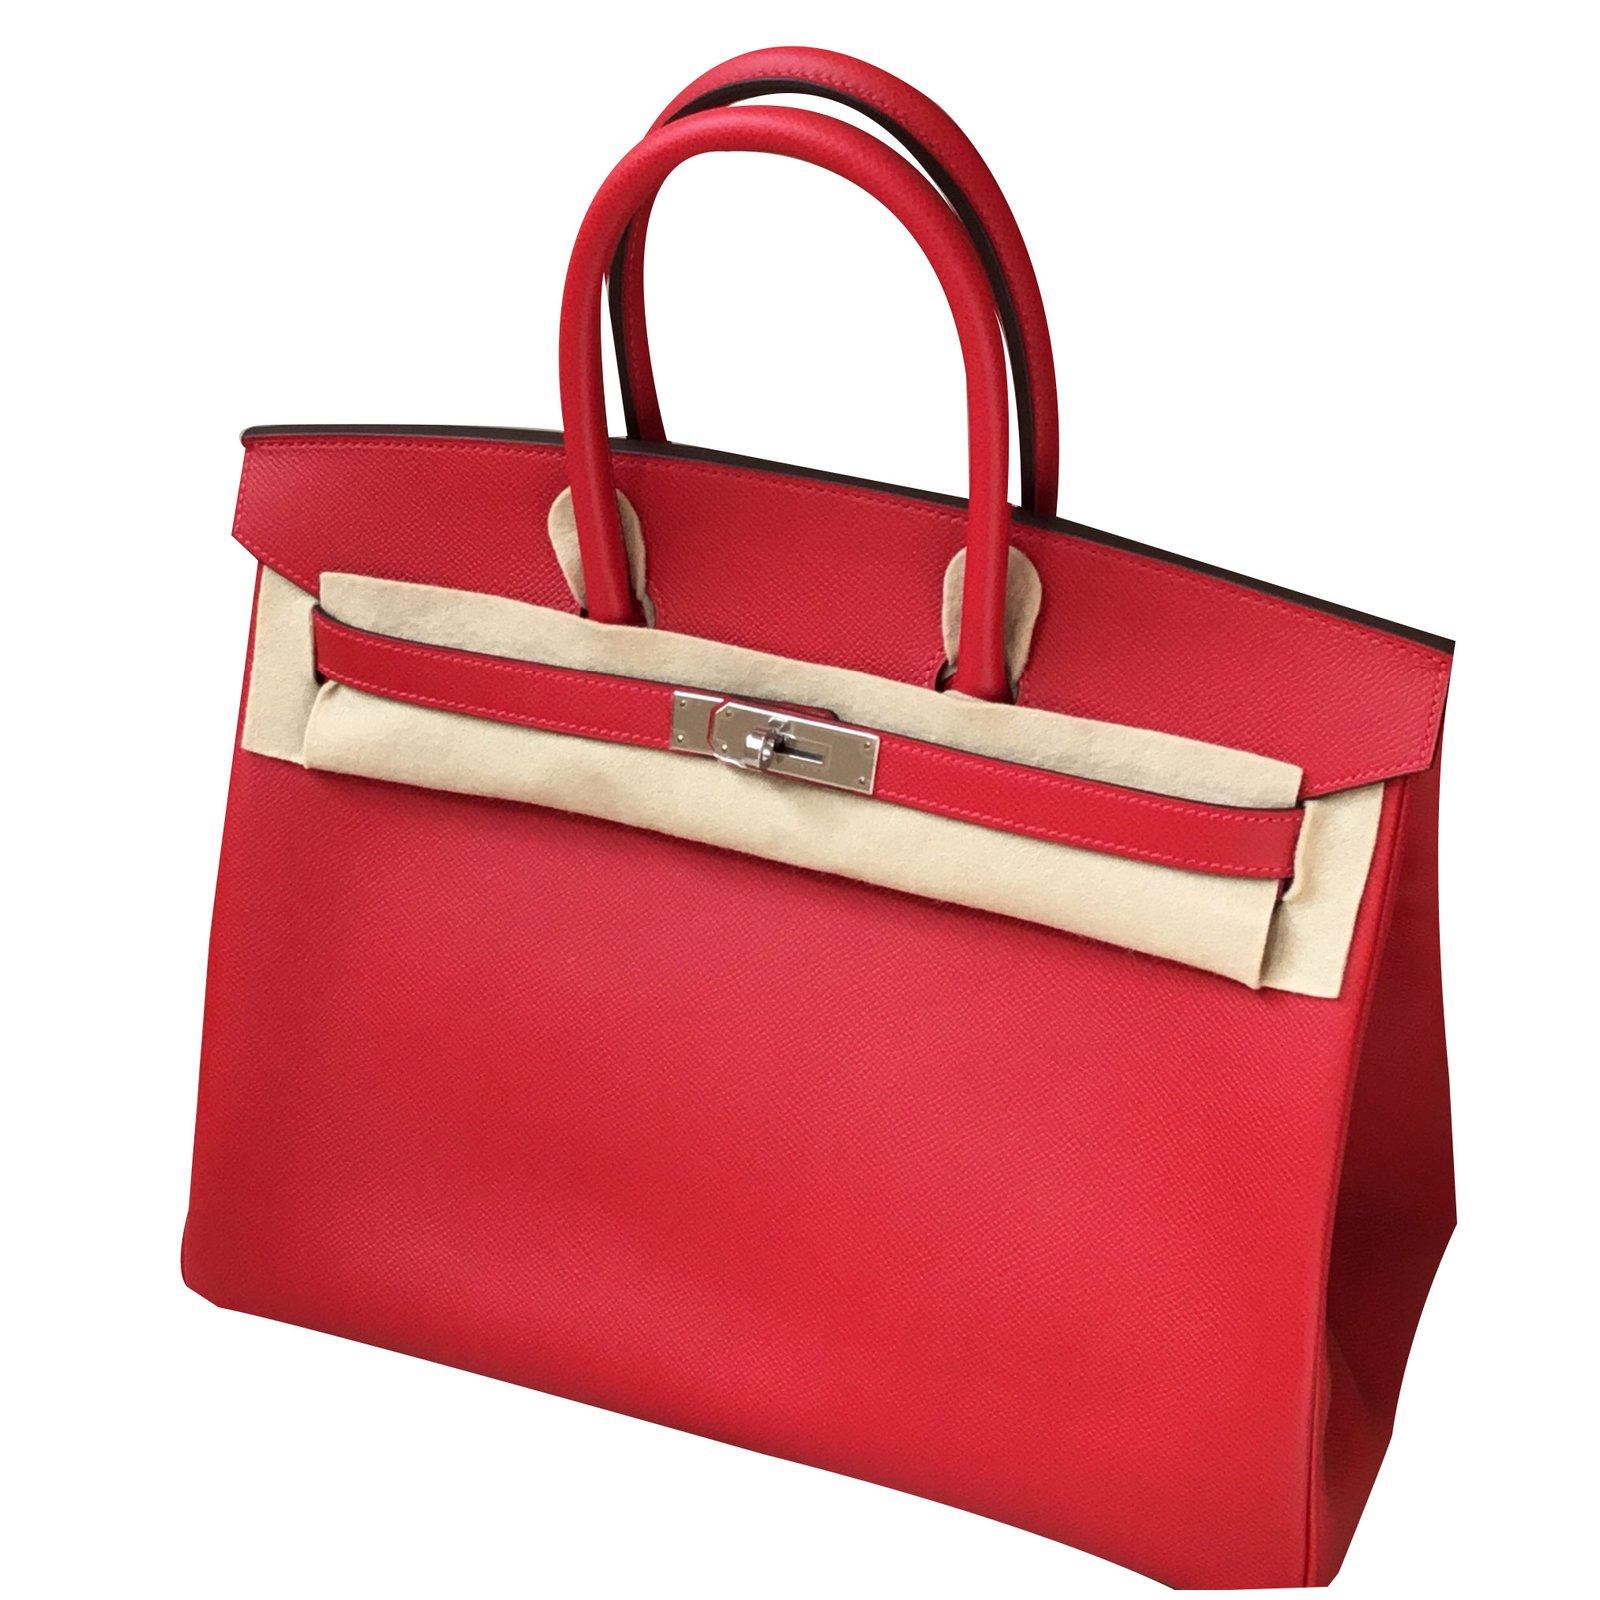 61951e9b75 ... ireland hermès hermes birkin 35 handbags leather red ref.47355 2a885  4bfe6